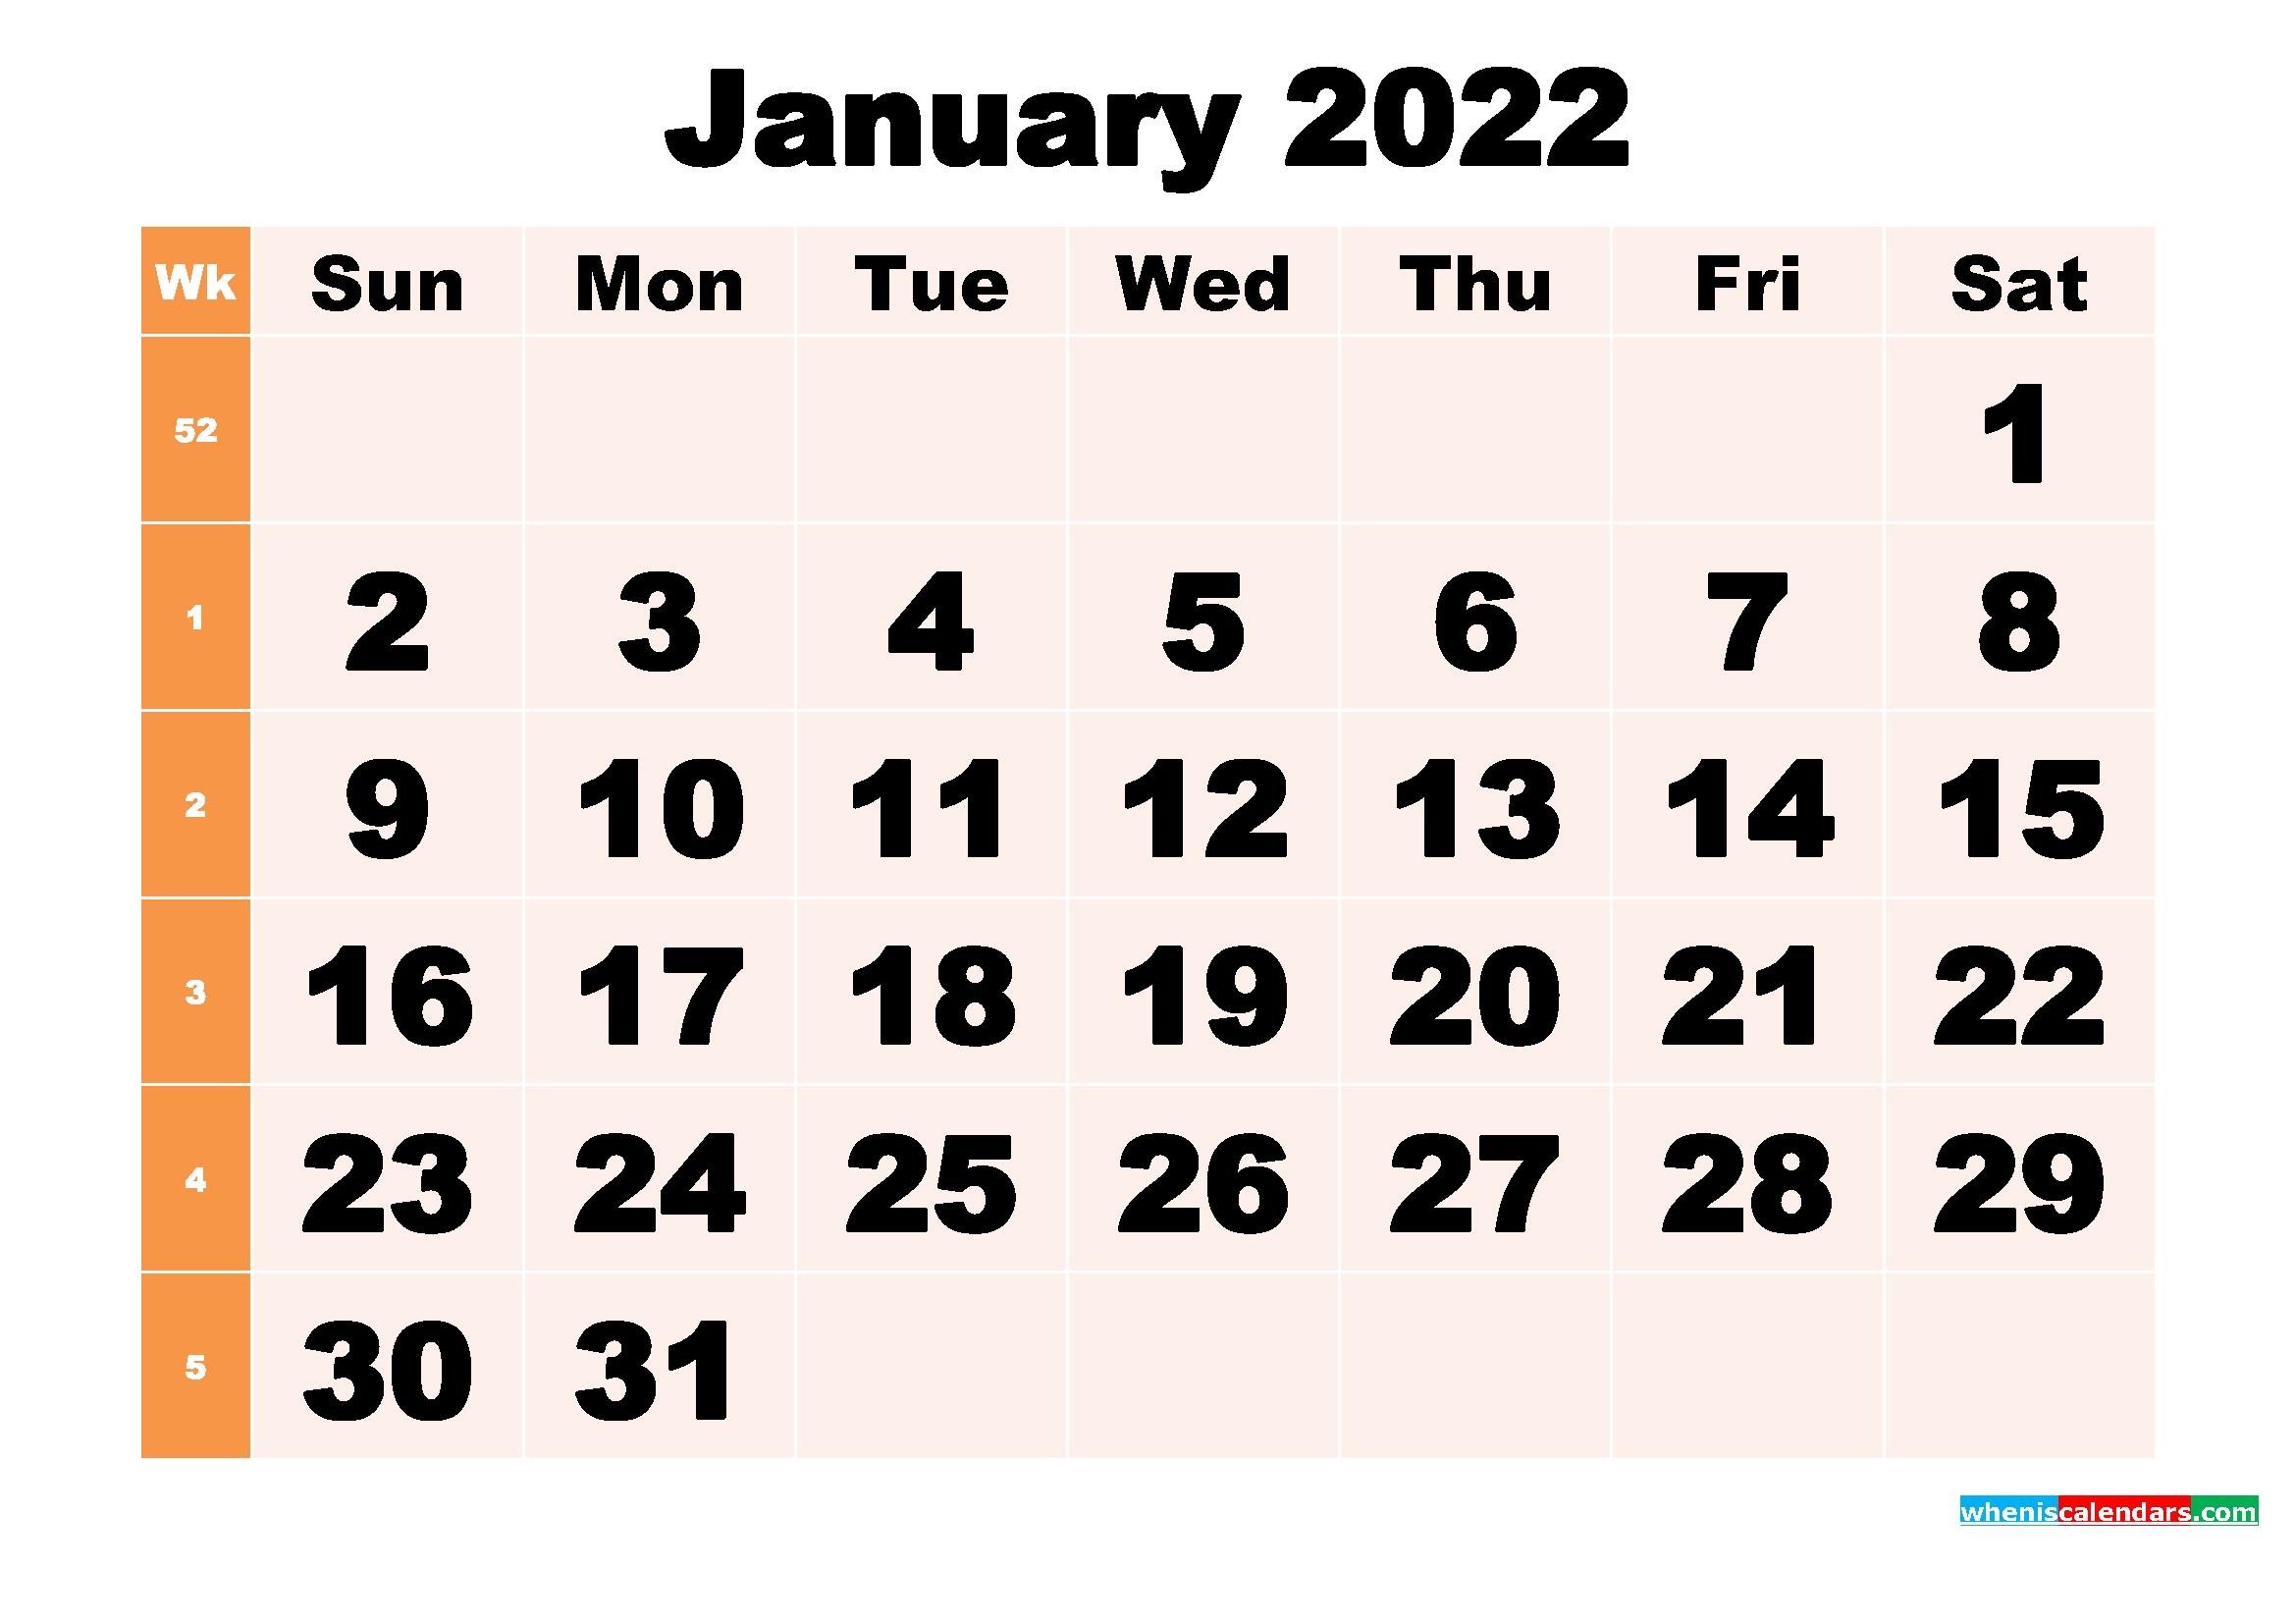 Free Printable January 2022 Calendar Template Word, Pdf Throughout January 2022 Calendar Printable Free